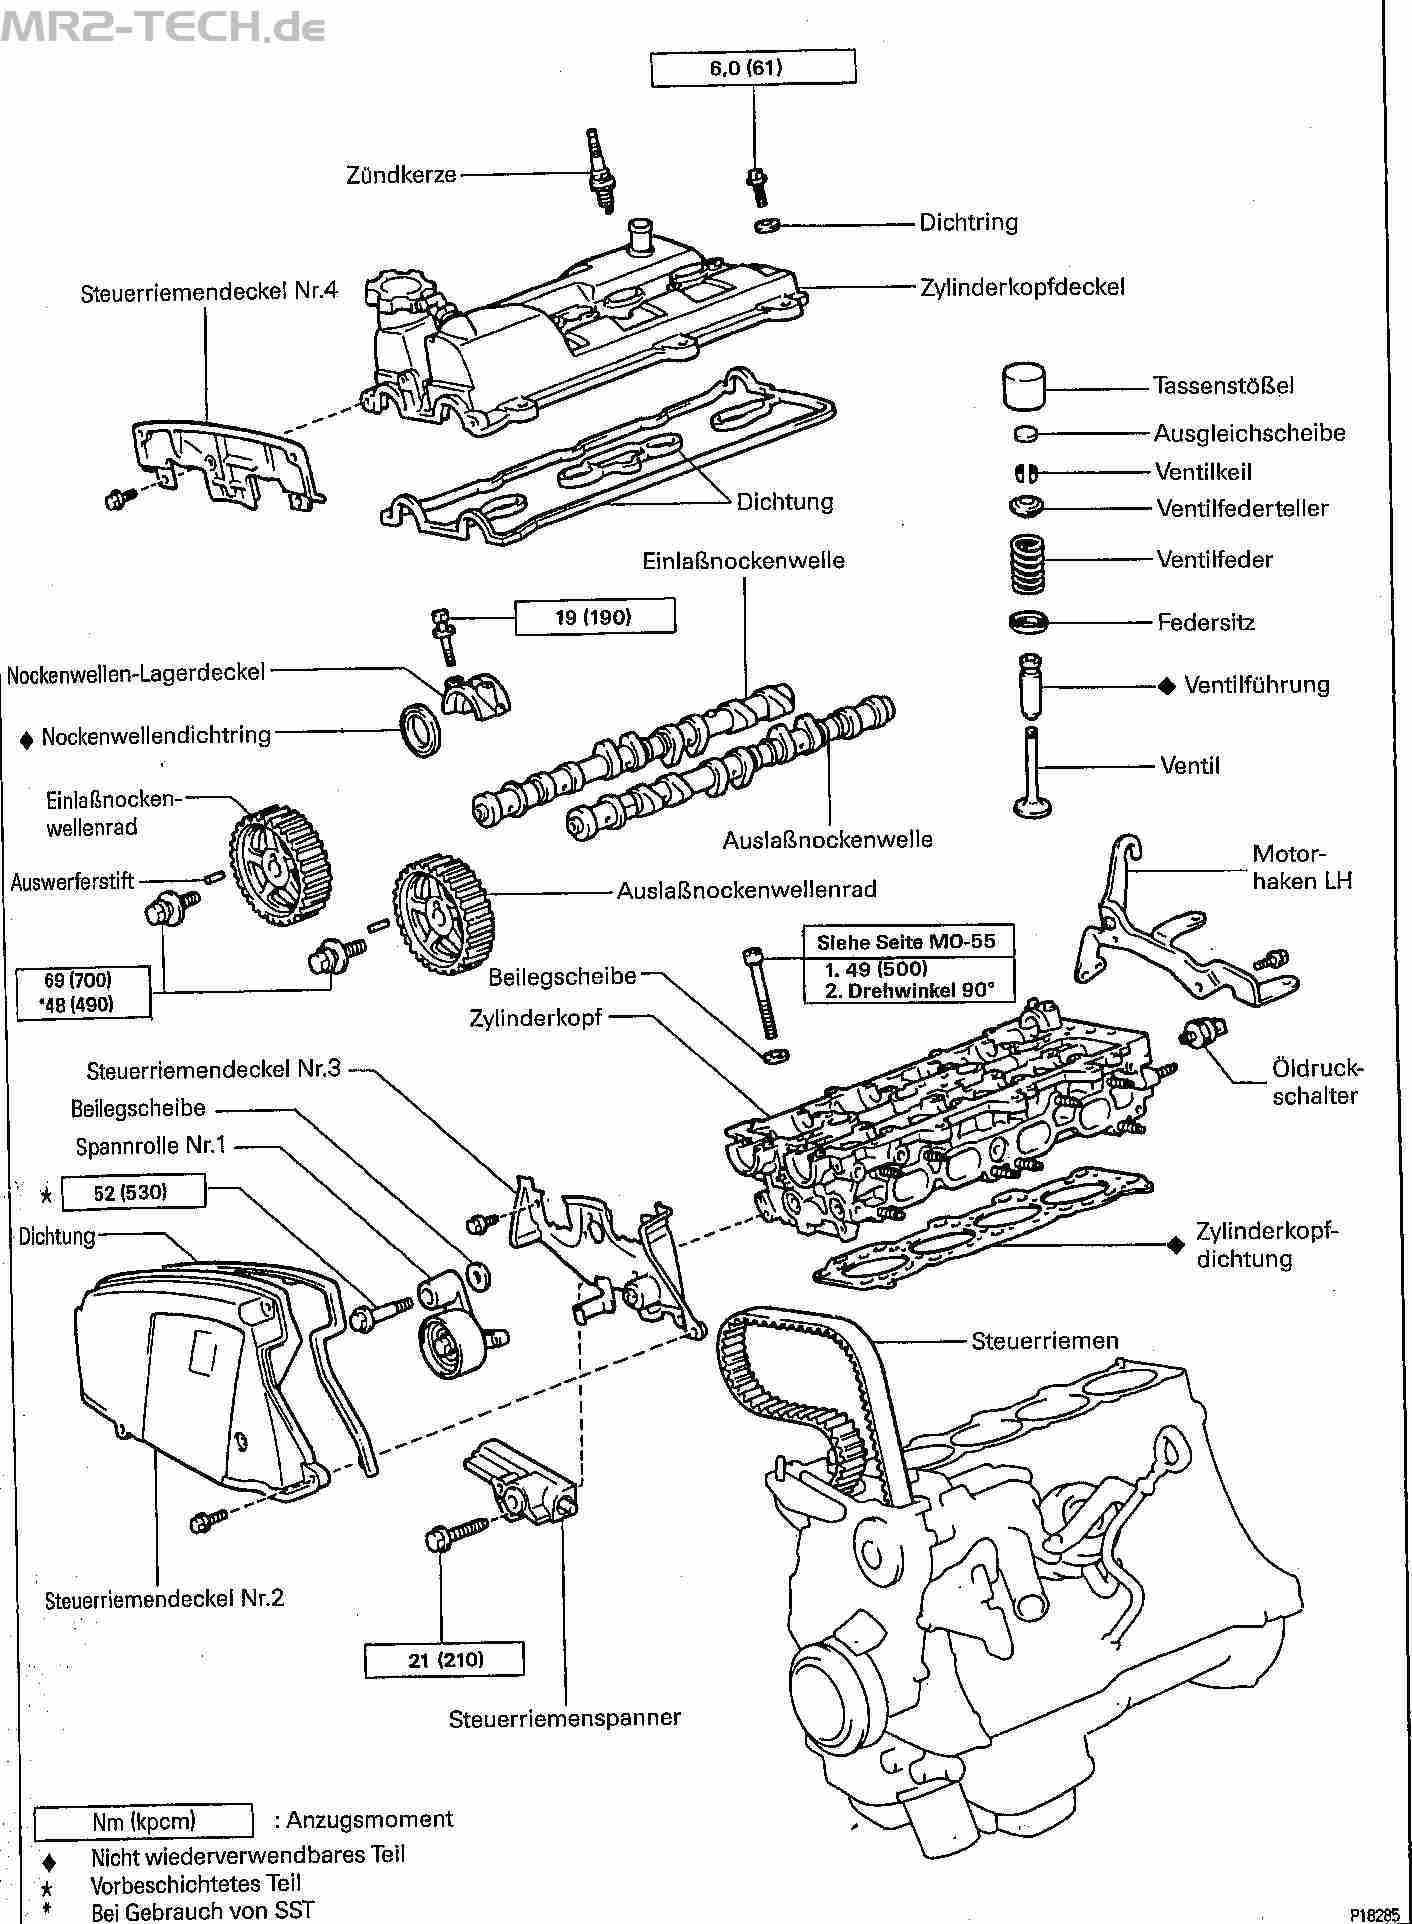 Aufbau Motor Zylinderkopf